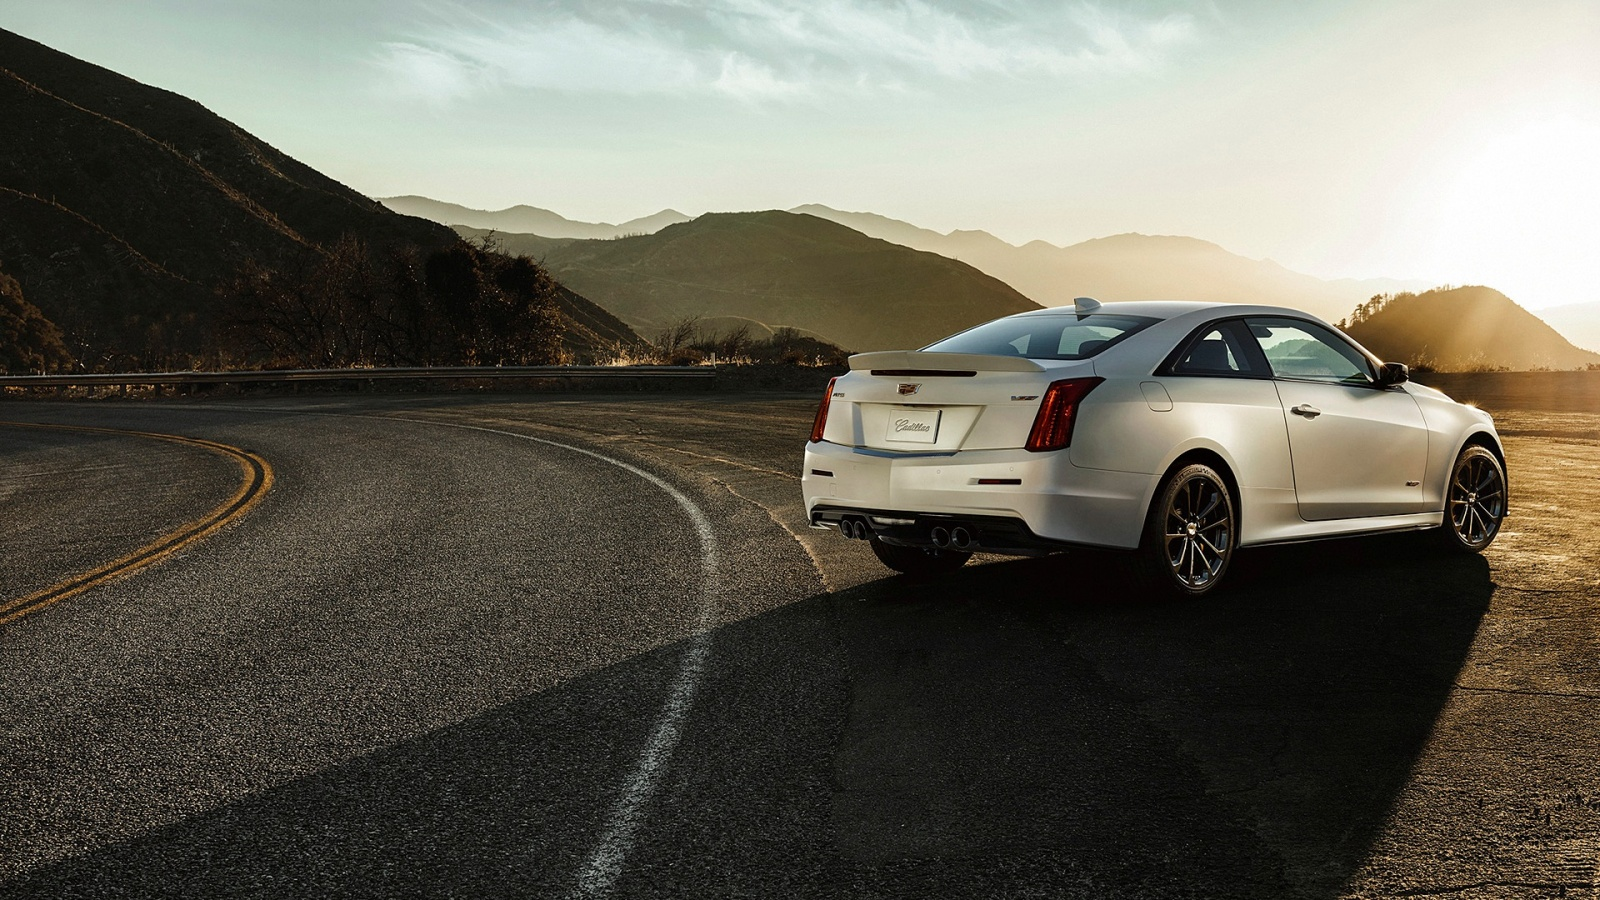 Cadillac Ats Coupe >> Cadillac ATS-V Coupe 2016 Wallpapers - 1600x900 - 619062